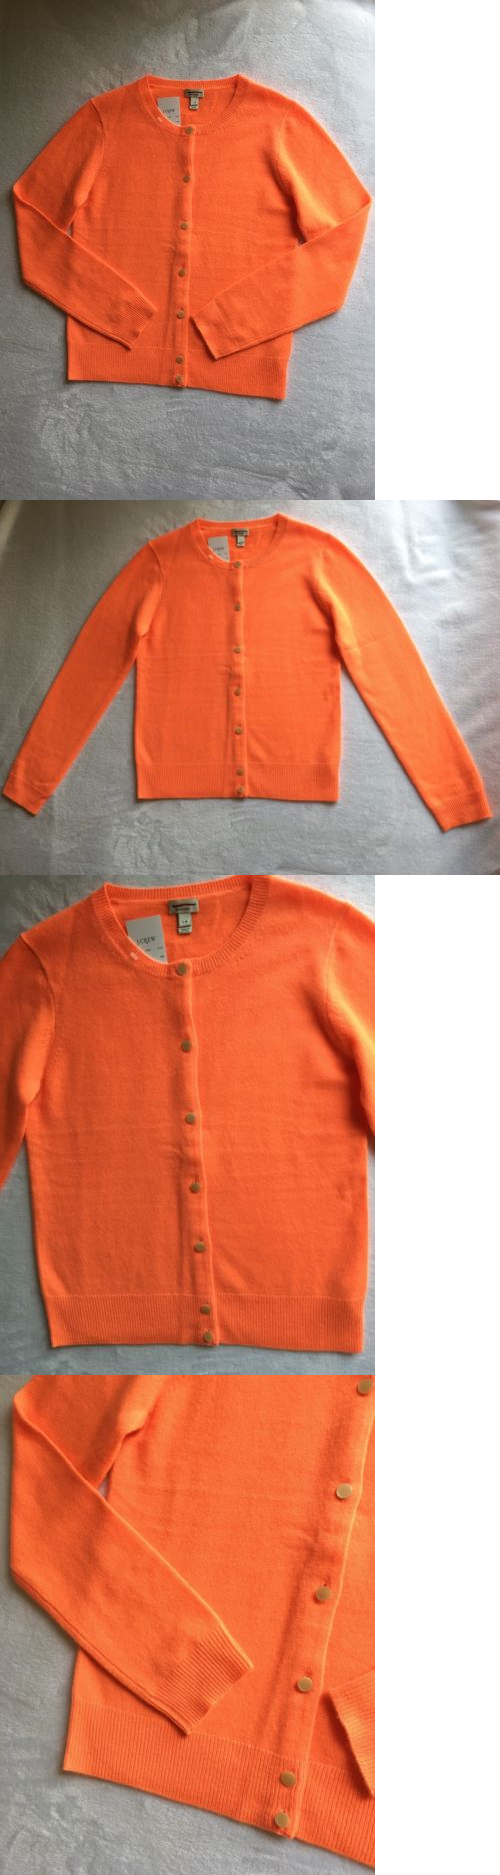 Sweaters 51582: Nwt Jcrew Crewcuts Girls Italian Cashmere Cardigan ...